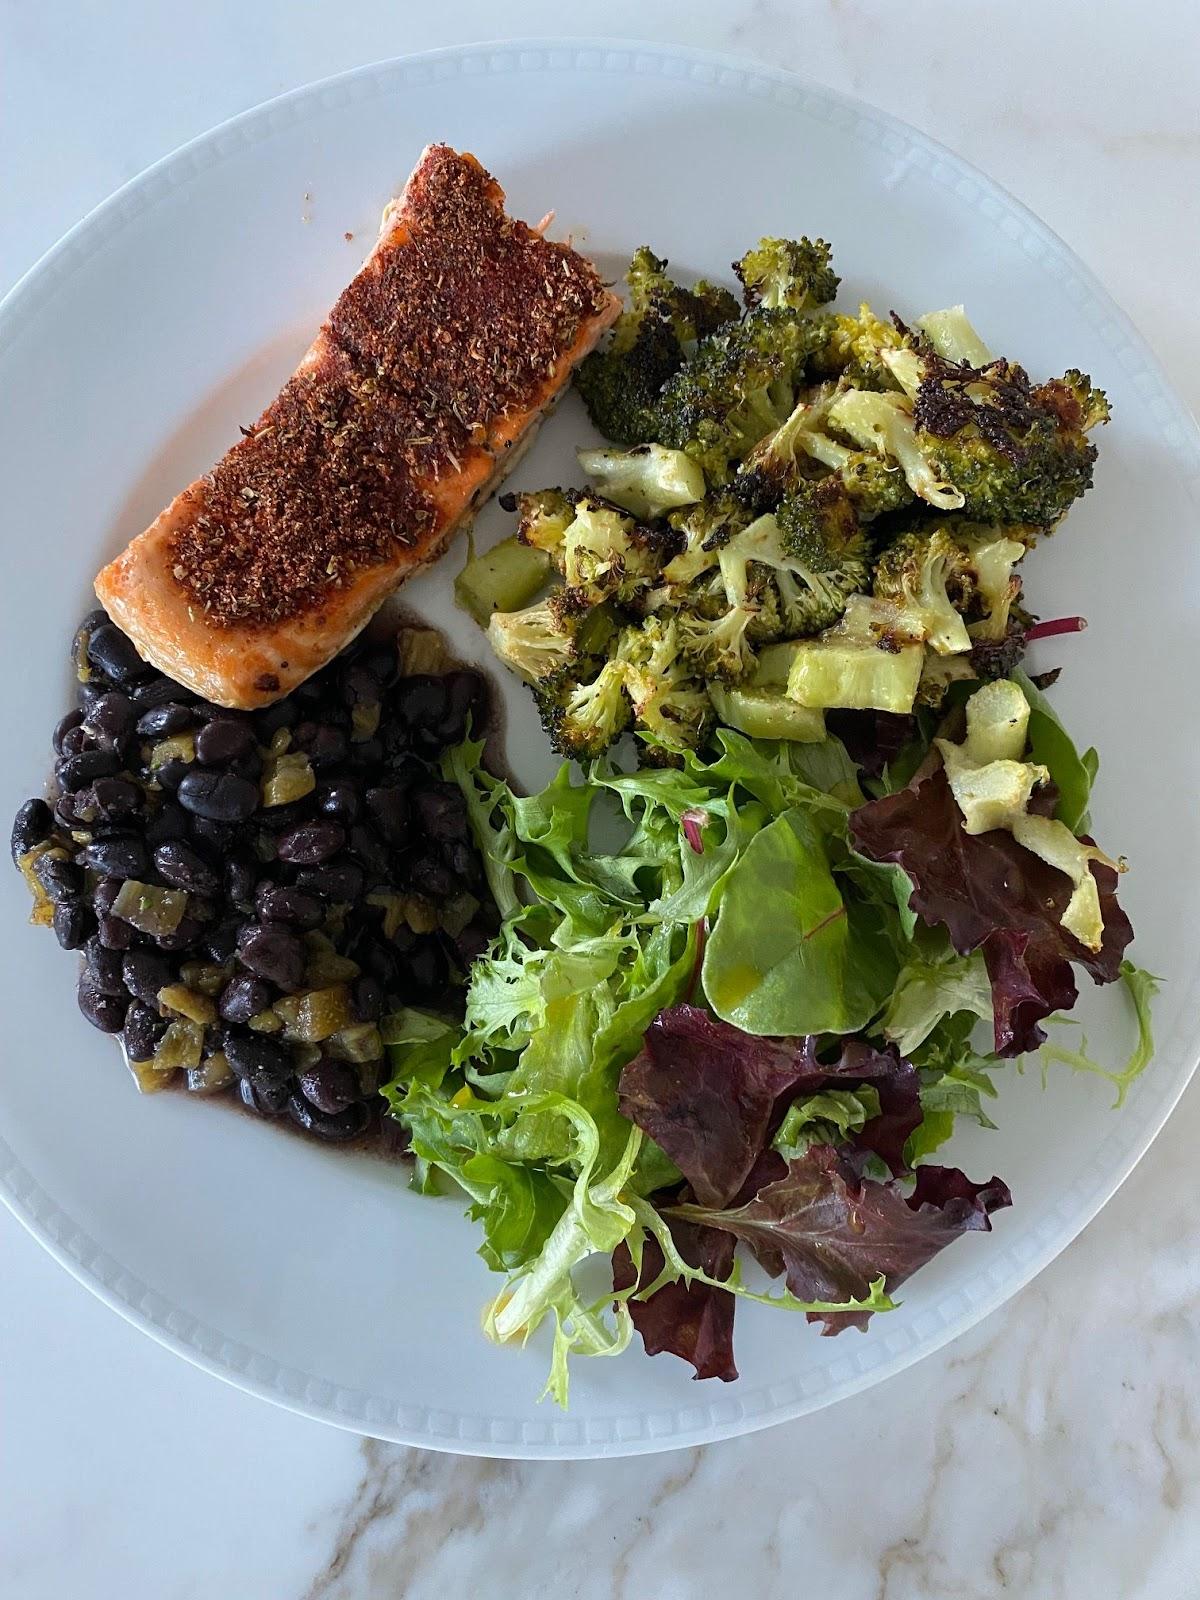 Dietitian Diary: Dinner